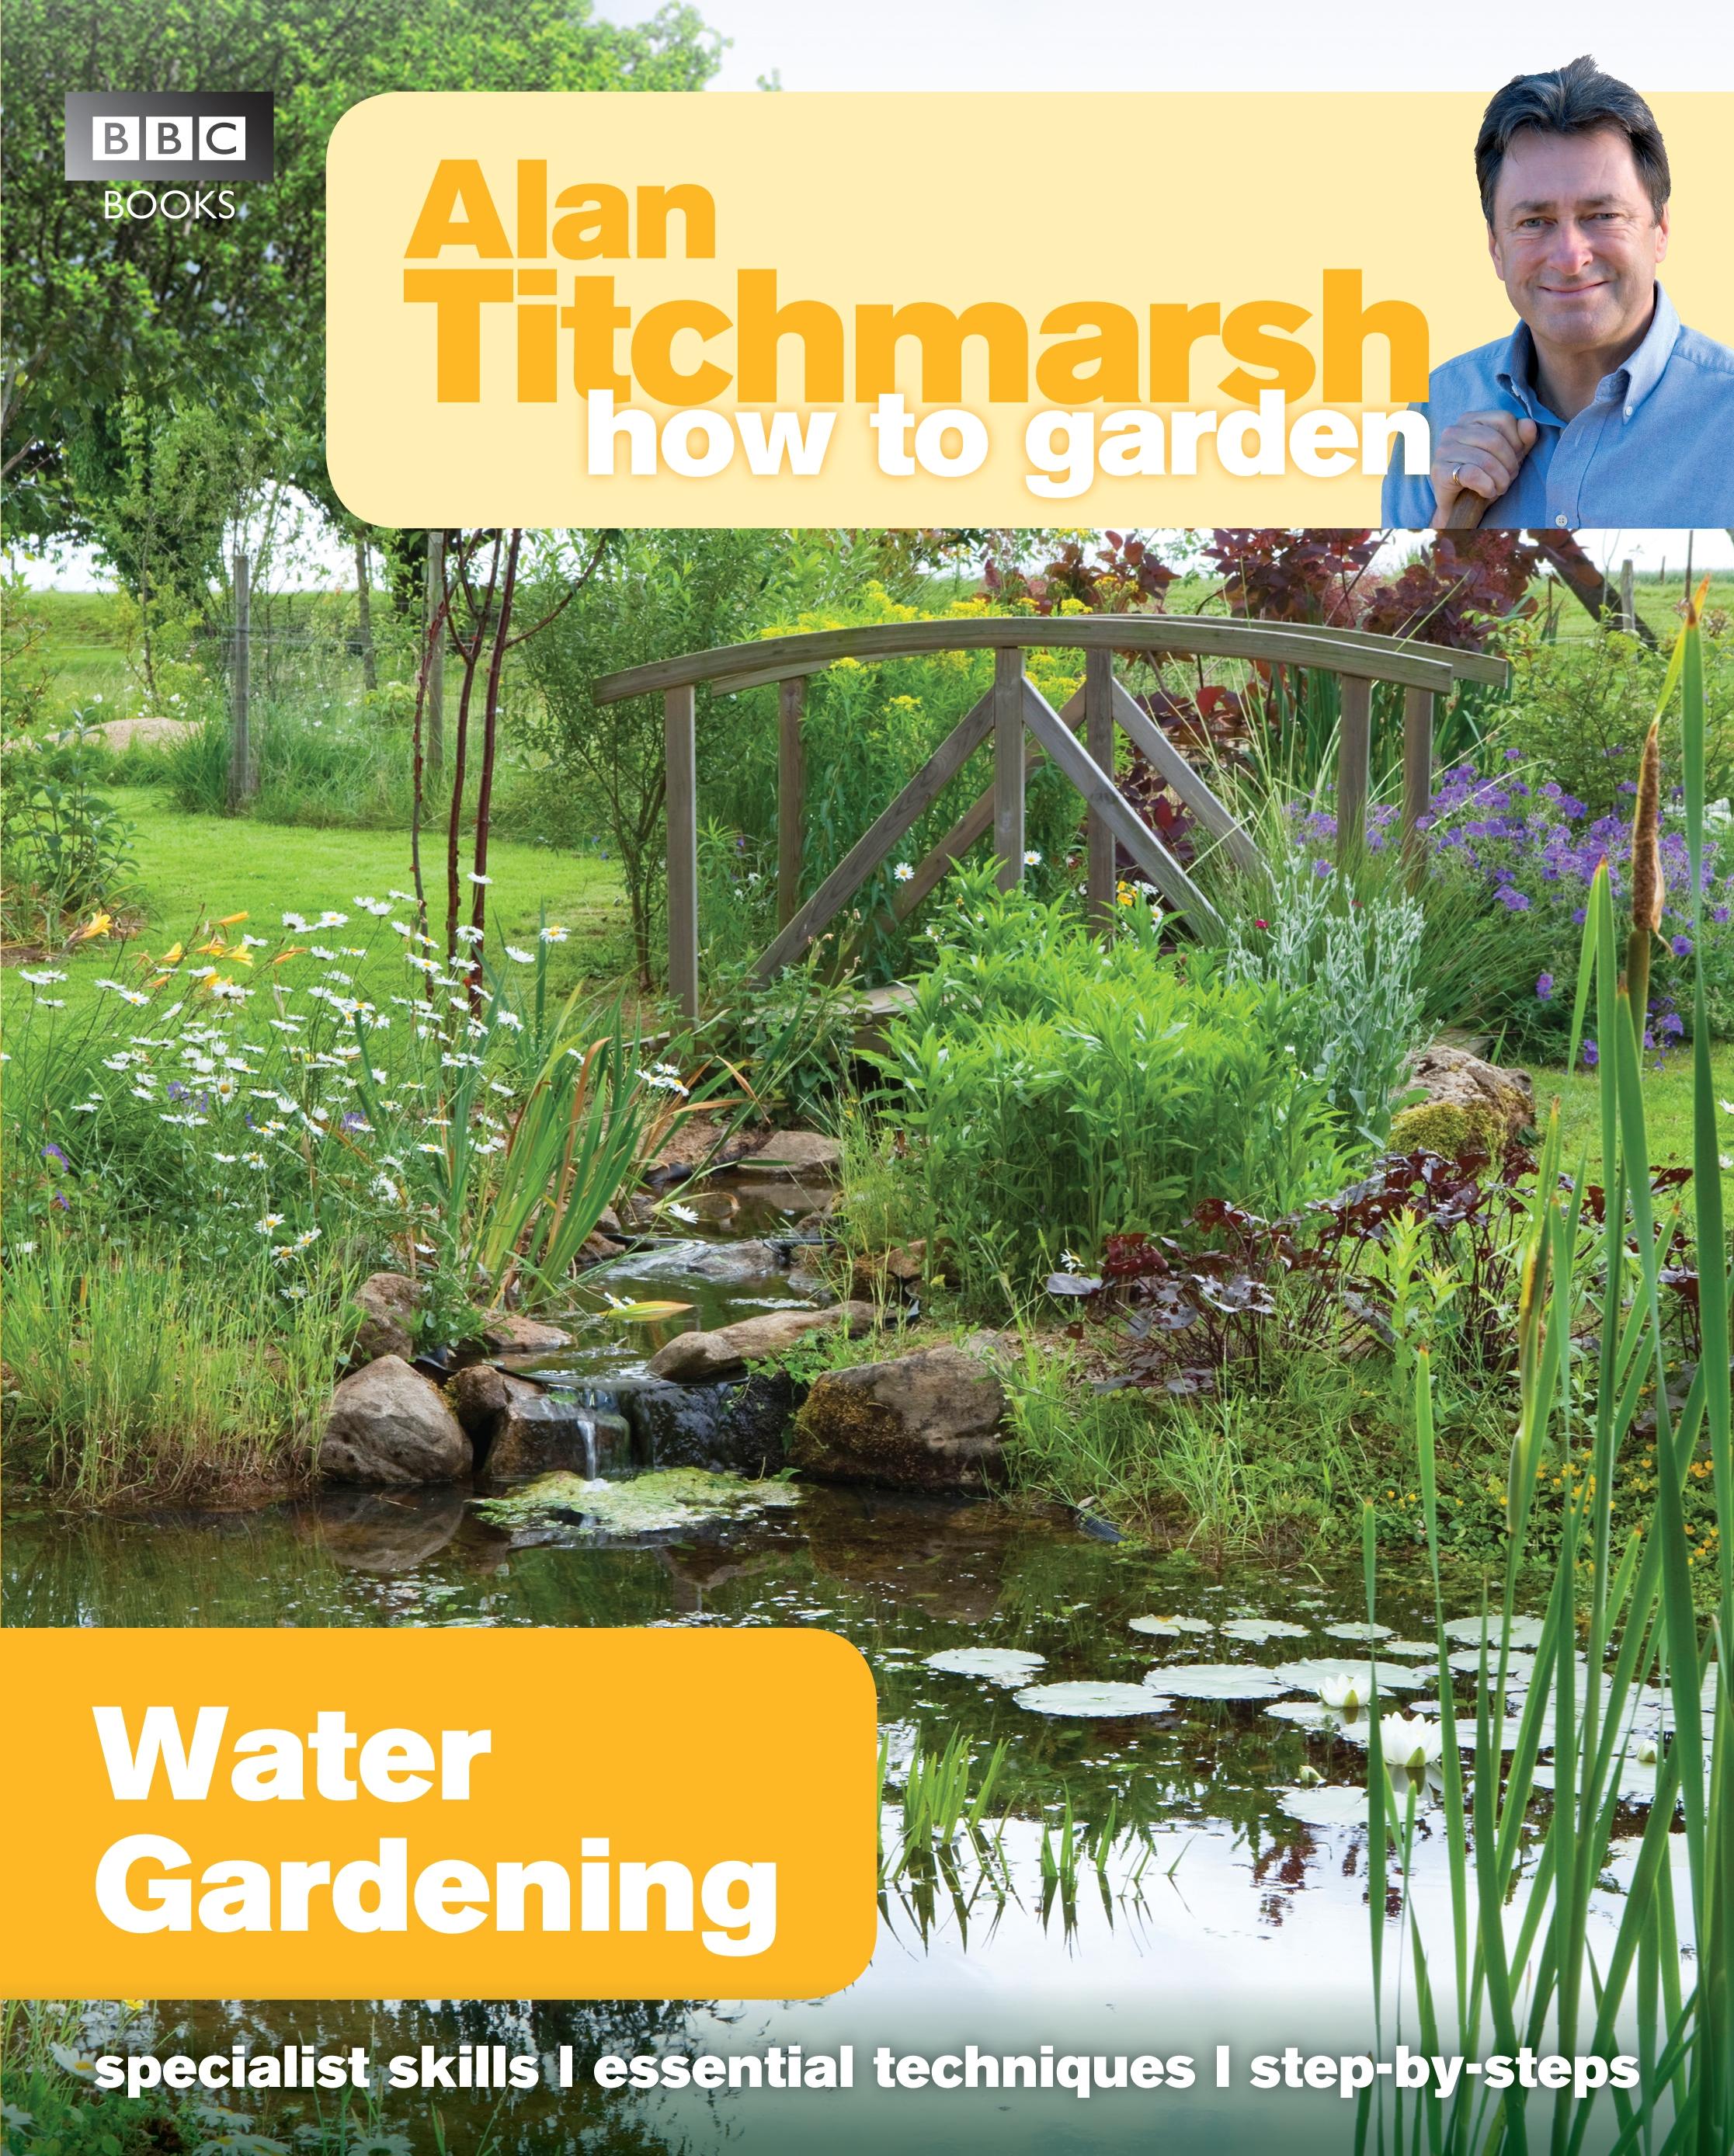 Alan Titchmarsh How to Garden Water Gardening by Alan Titchmarsh